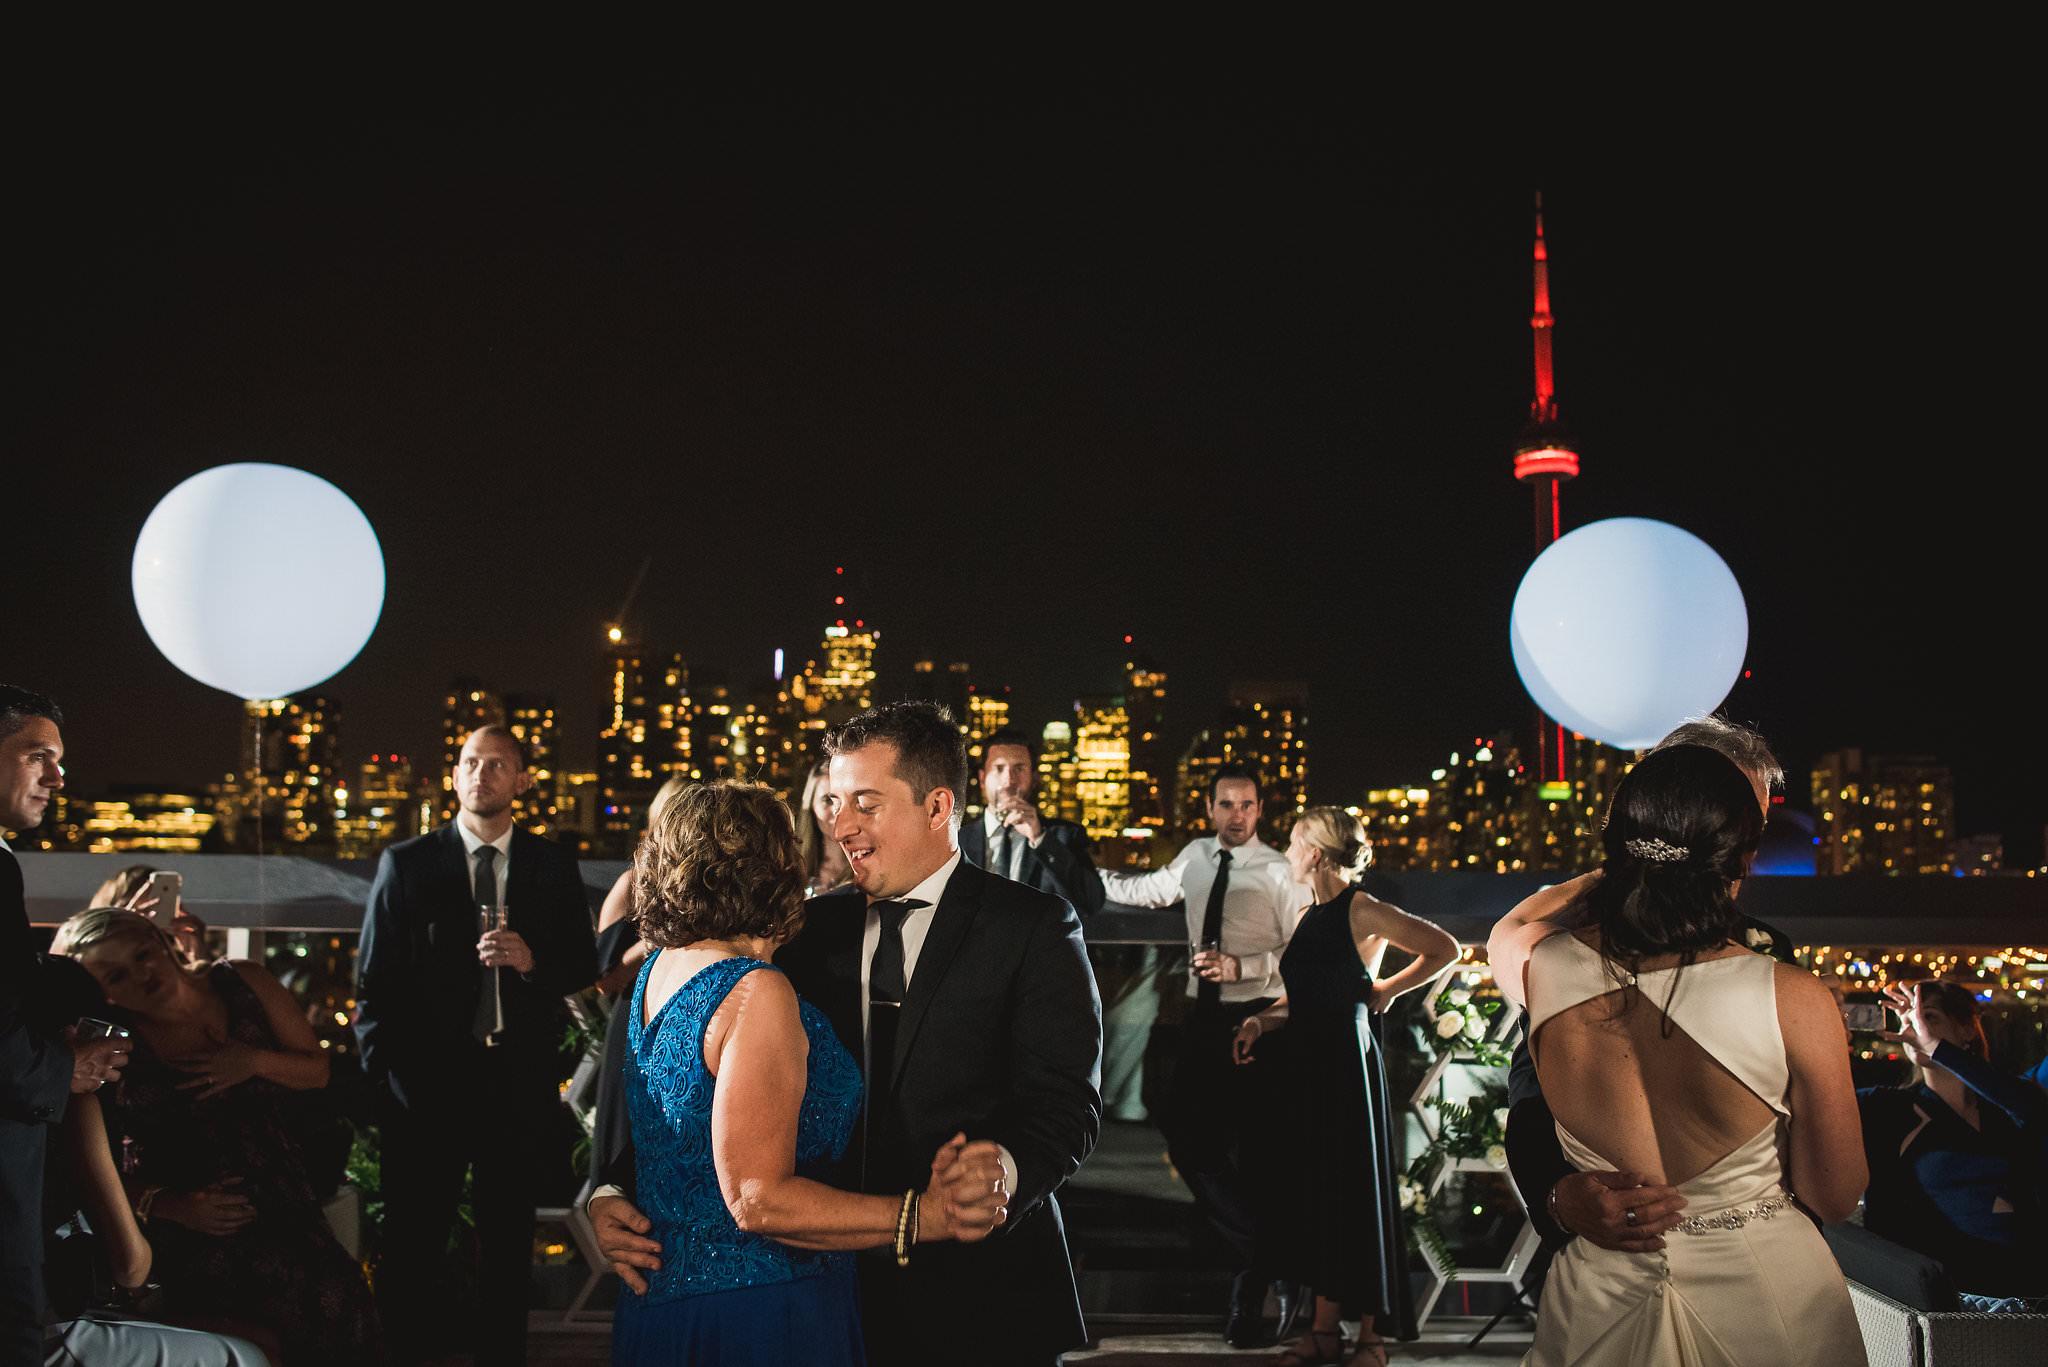 Cristin Rob Thompson Hotel Wedding Photos 696 - Thompson Hotel Wedding Photos